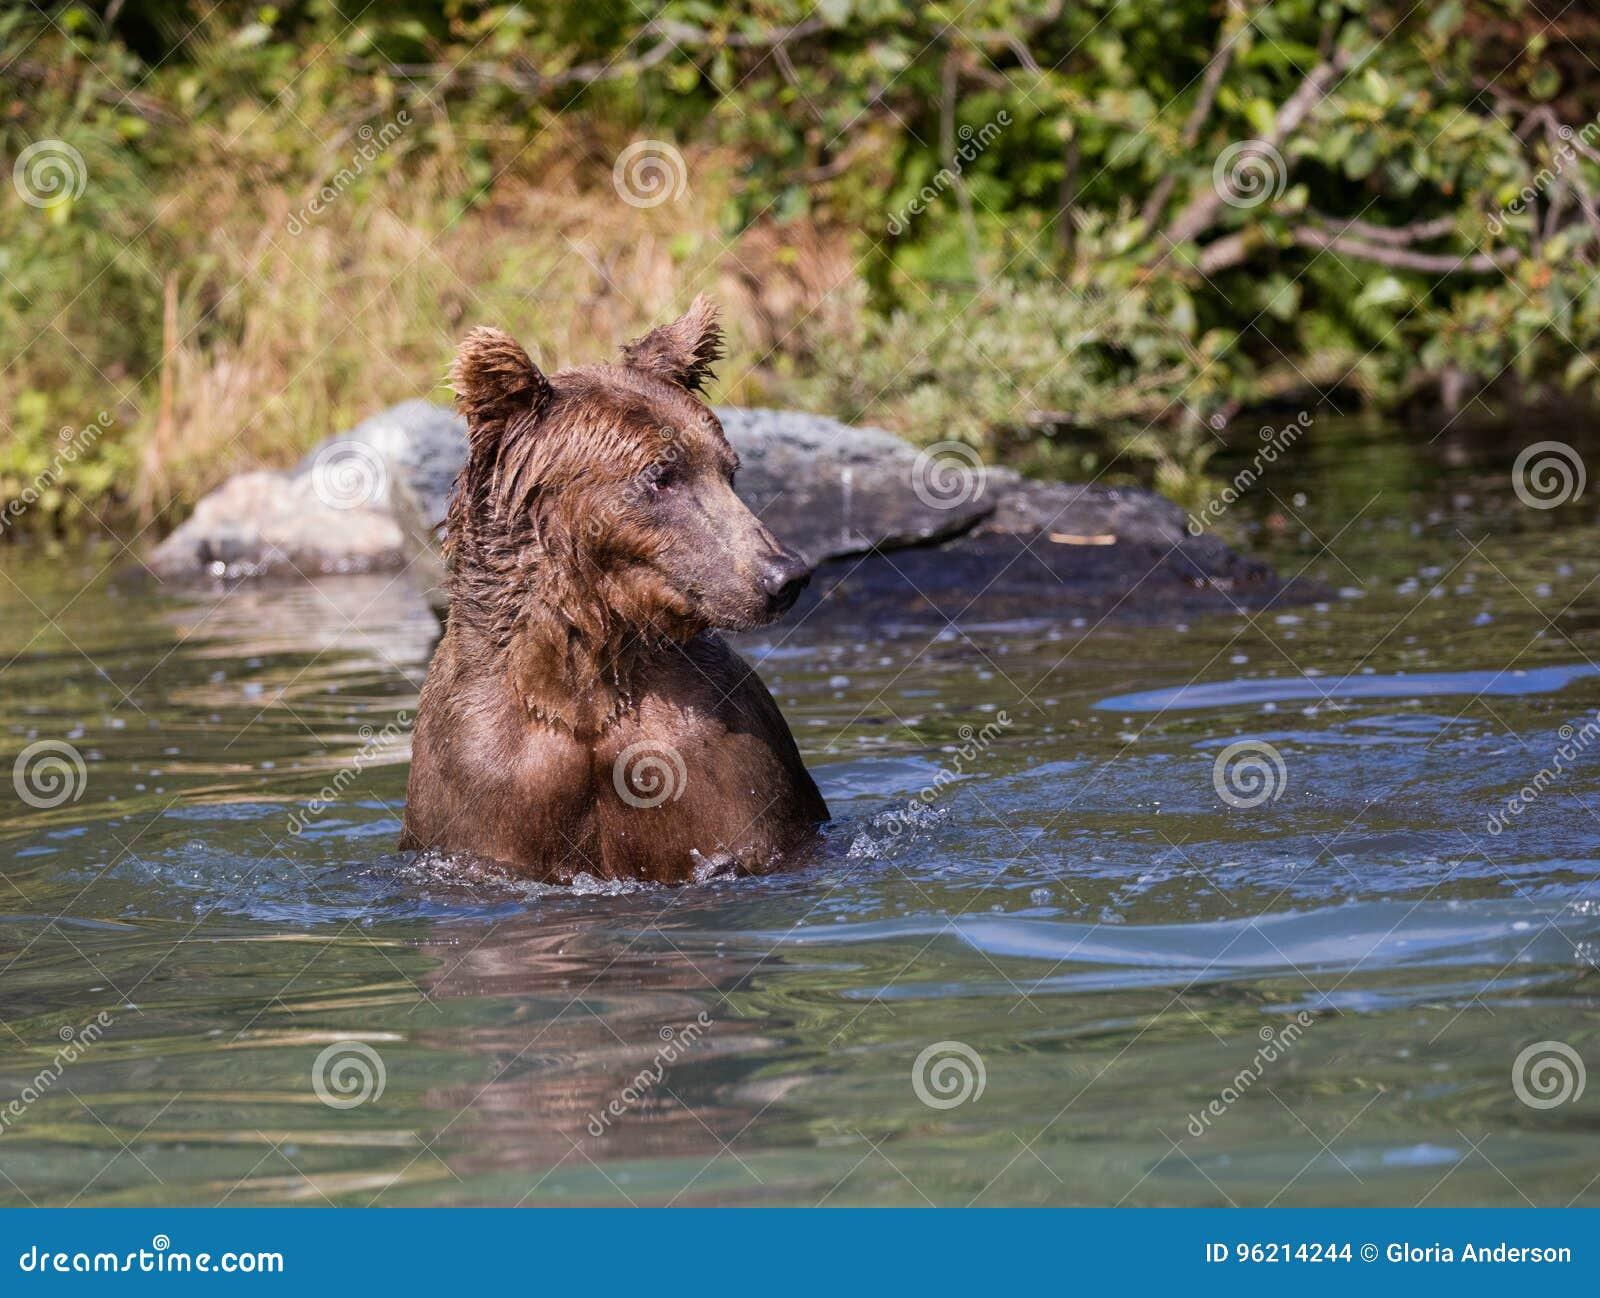 Coastal brown bear in the water